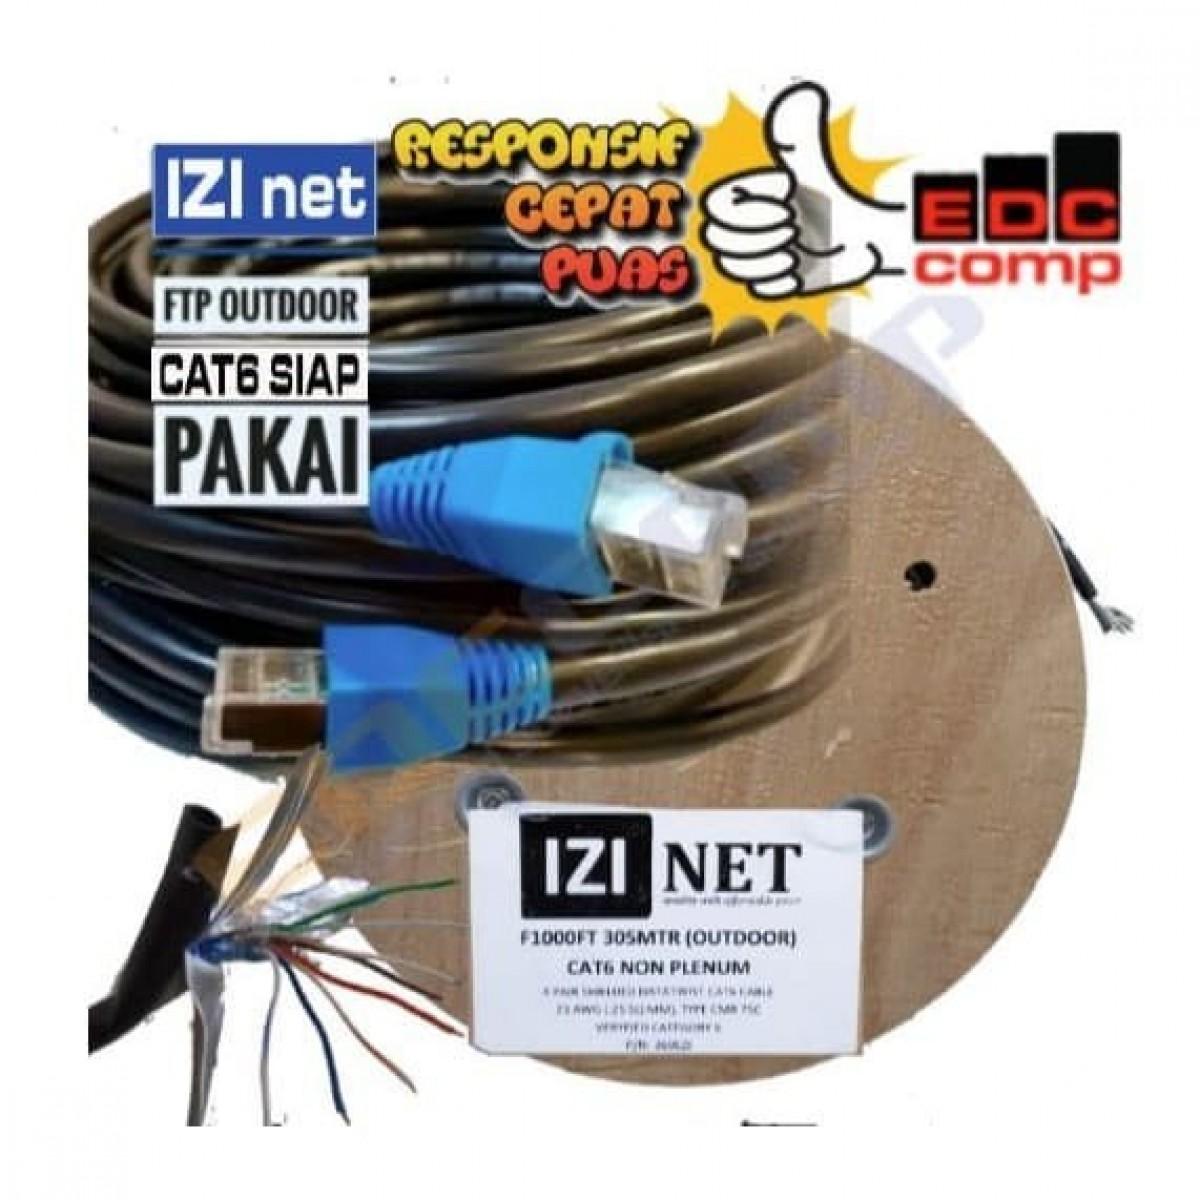 Cable STP/FTP Cat 5e Outdoor Cable 80 Meter IZI net Original - EdcComp